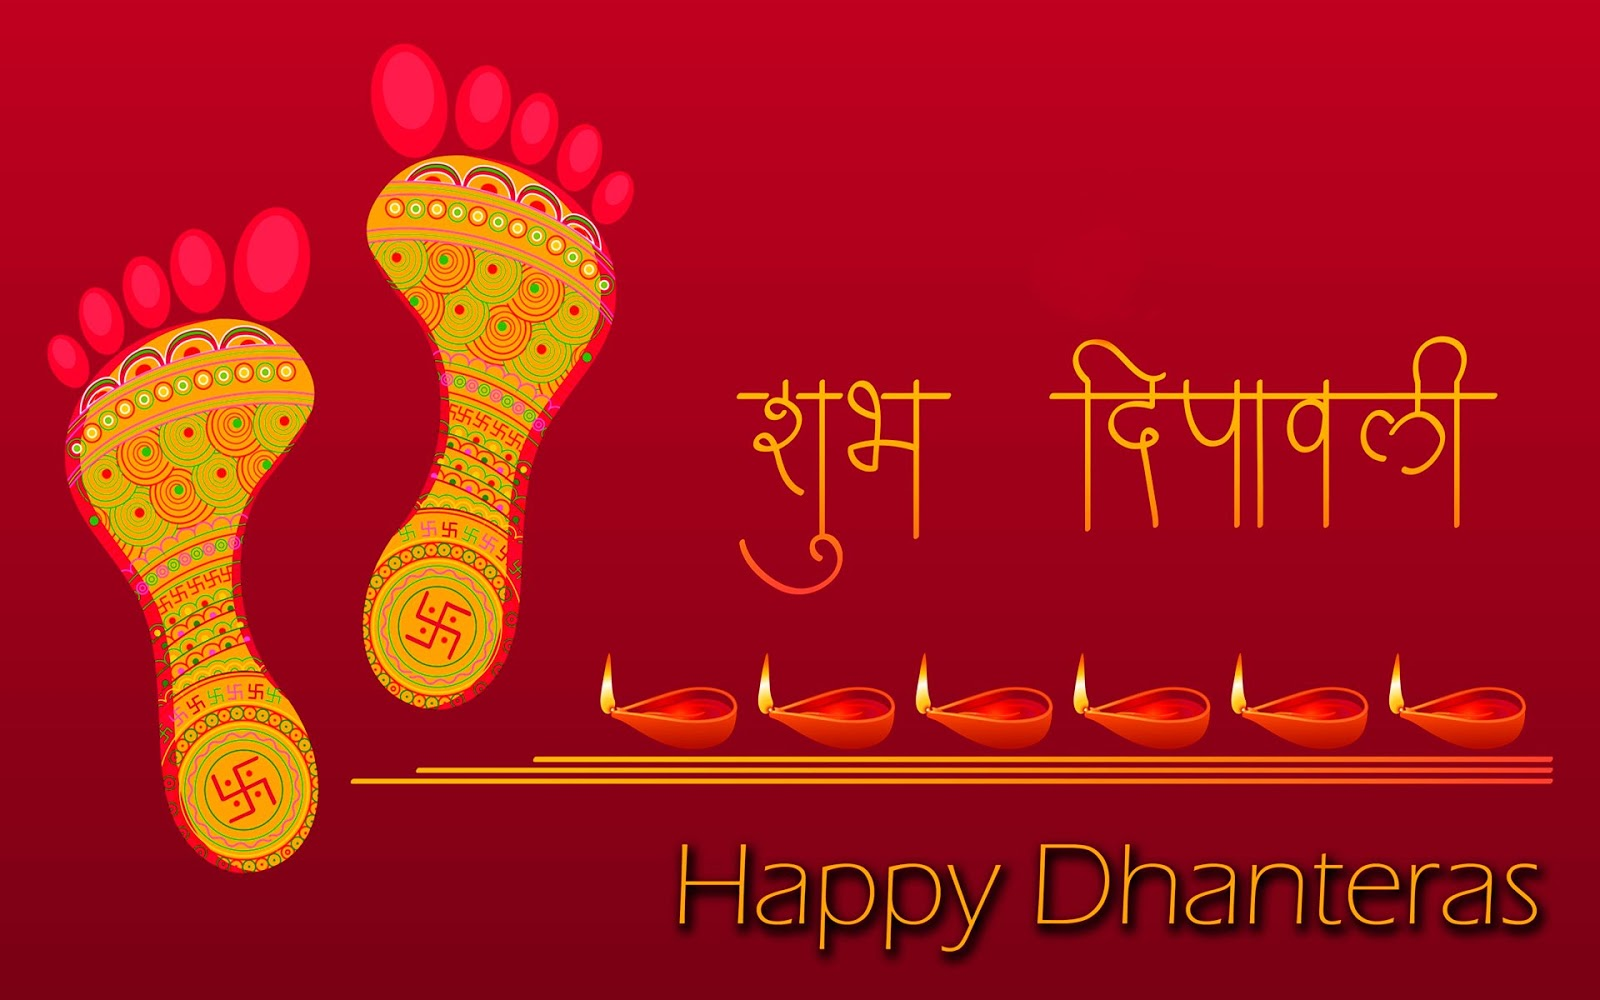 Diwali Wallpaper In English Affordable Fabulous Diwali Greeting